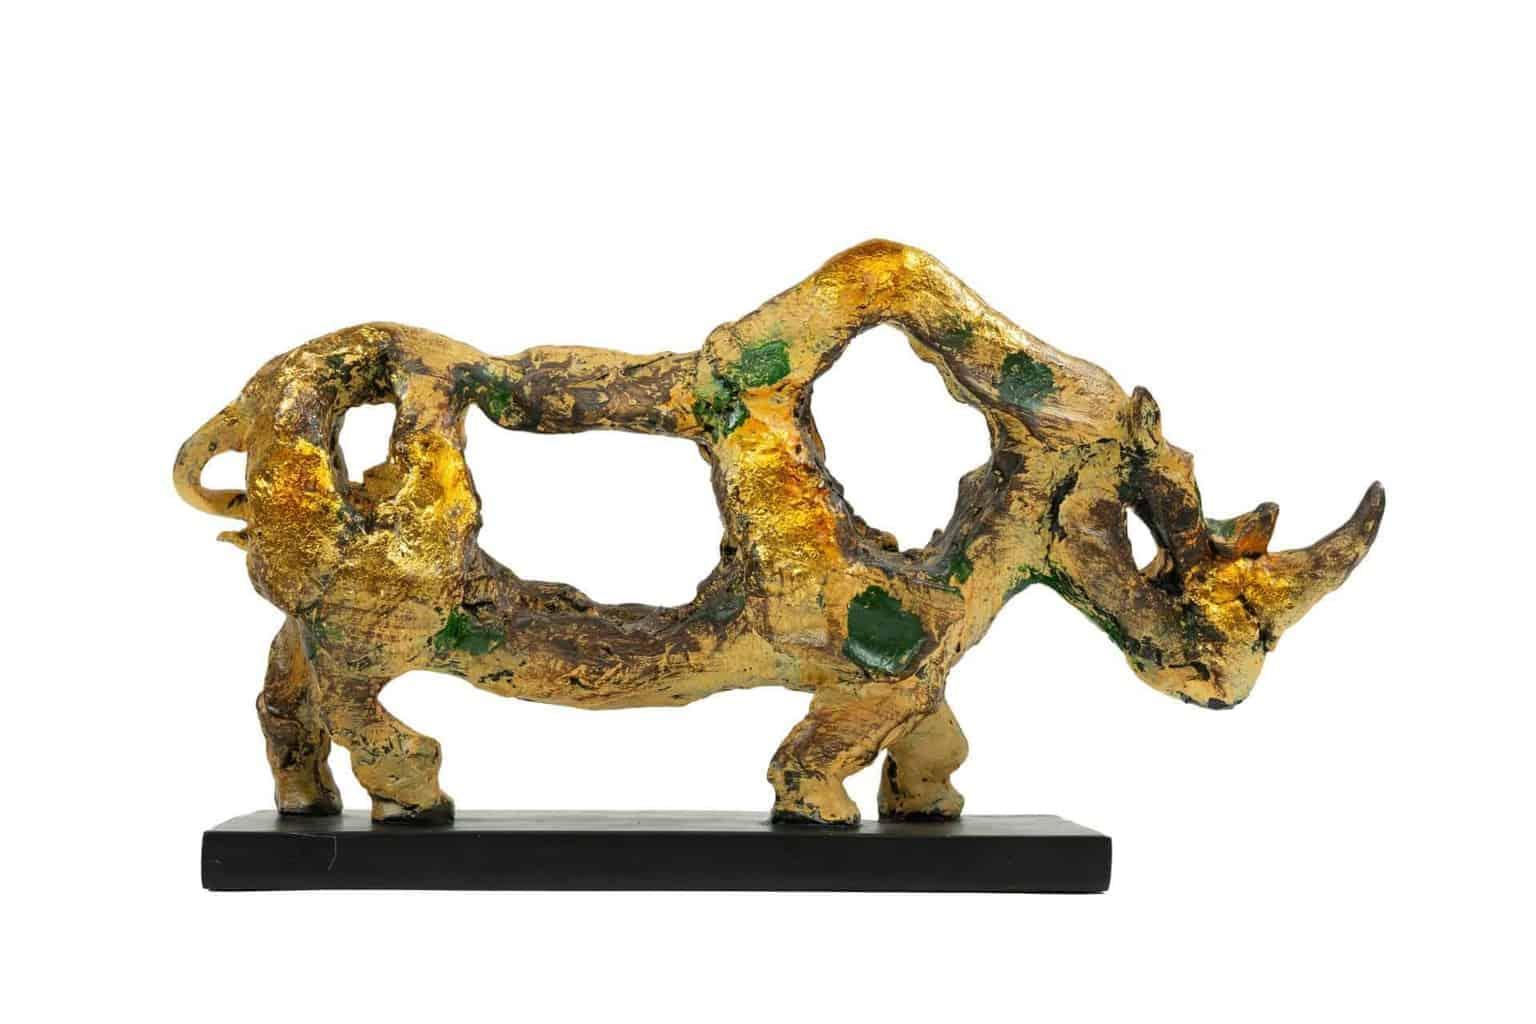 Decoratie-neushoorn-goud-1-scaled-1.jpg